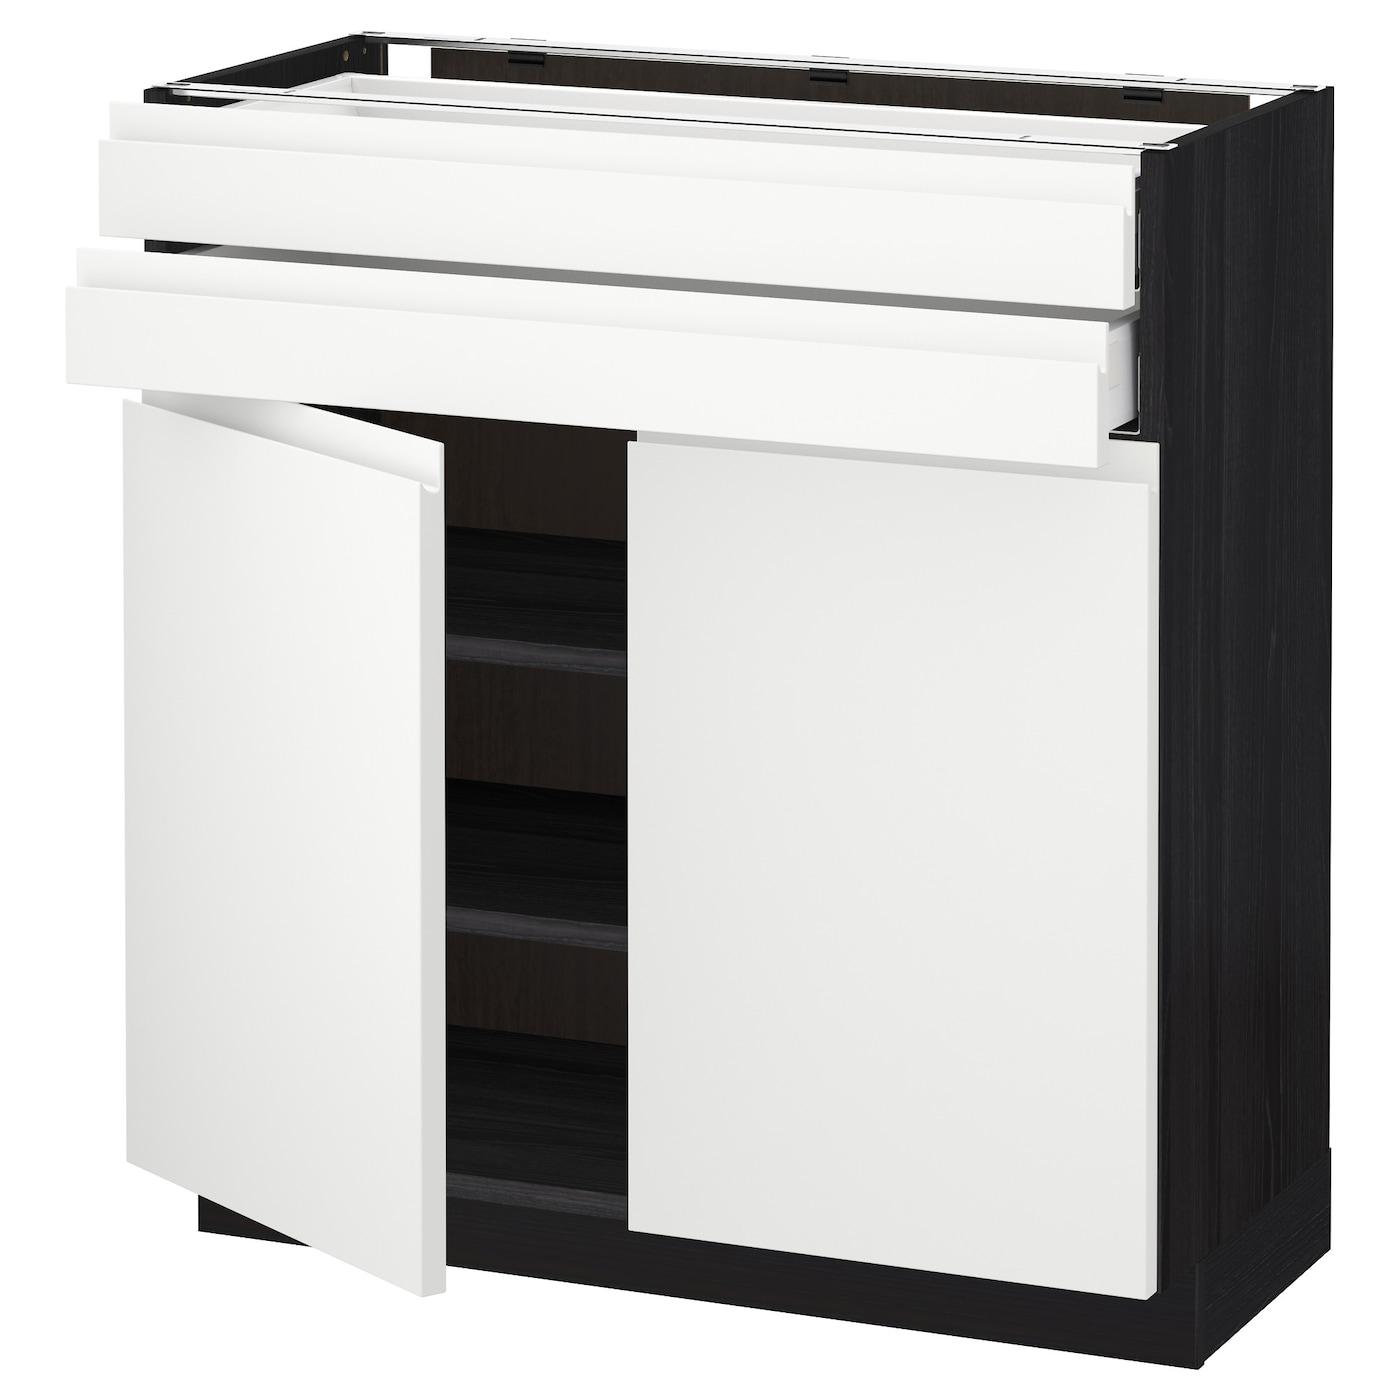 Metod maximera base cabinet w 2 doors 2 drawers black for Black kitchen base cabinets